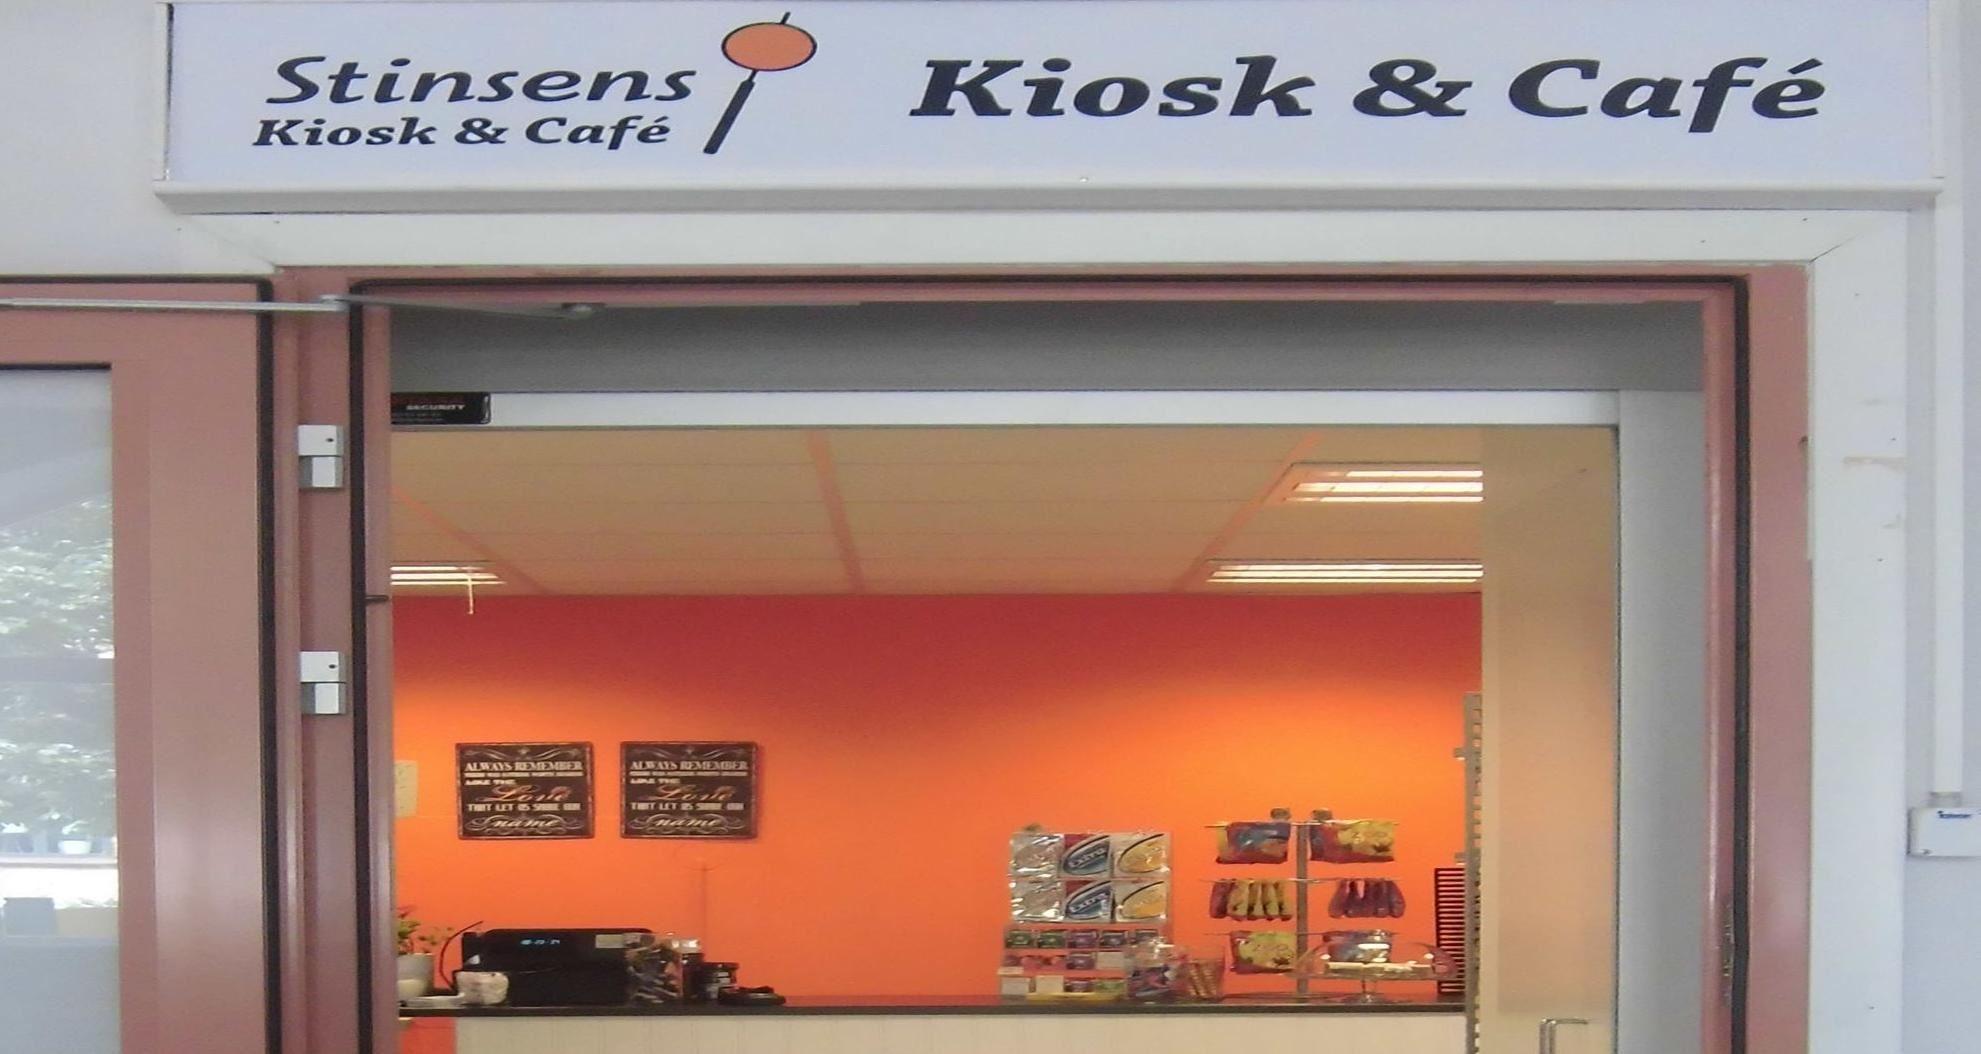 Stinsens Kiosk & Café